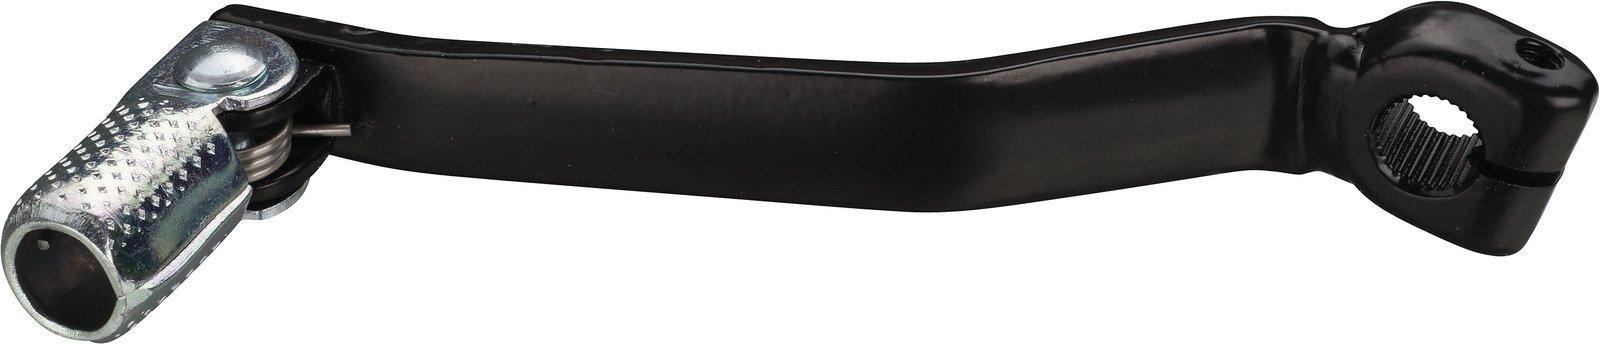 Heavy Duty Foldable Gear Lever Shift Lever For Yamaha TT500 XT250 XT500 XT550 2-239